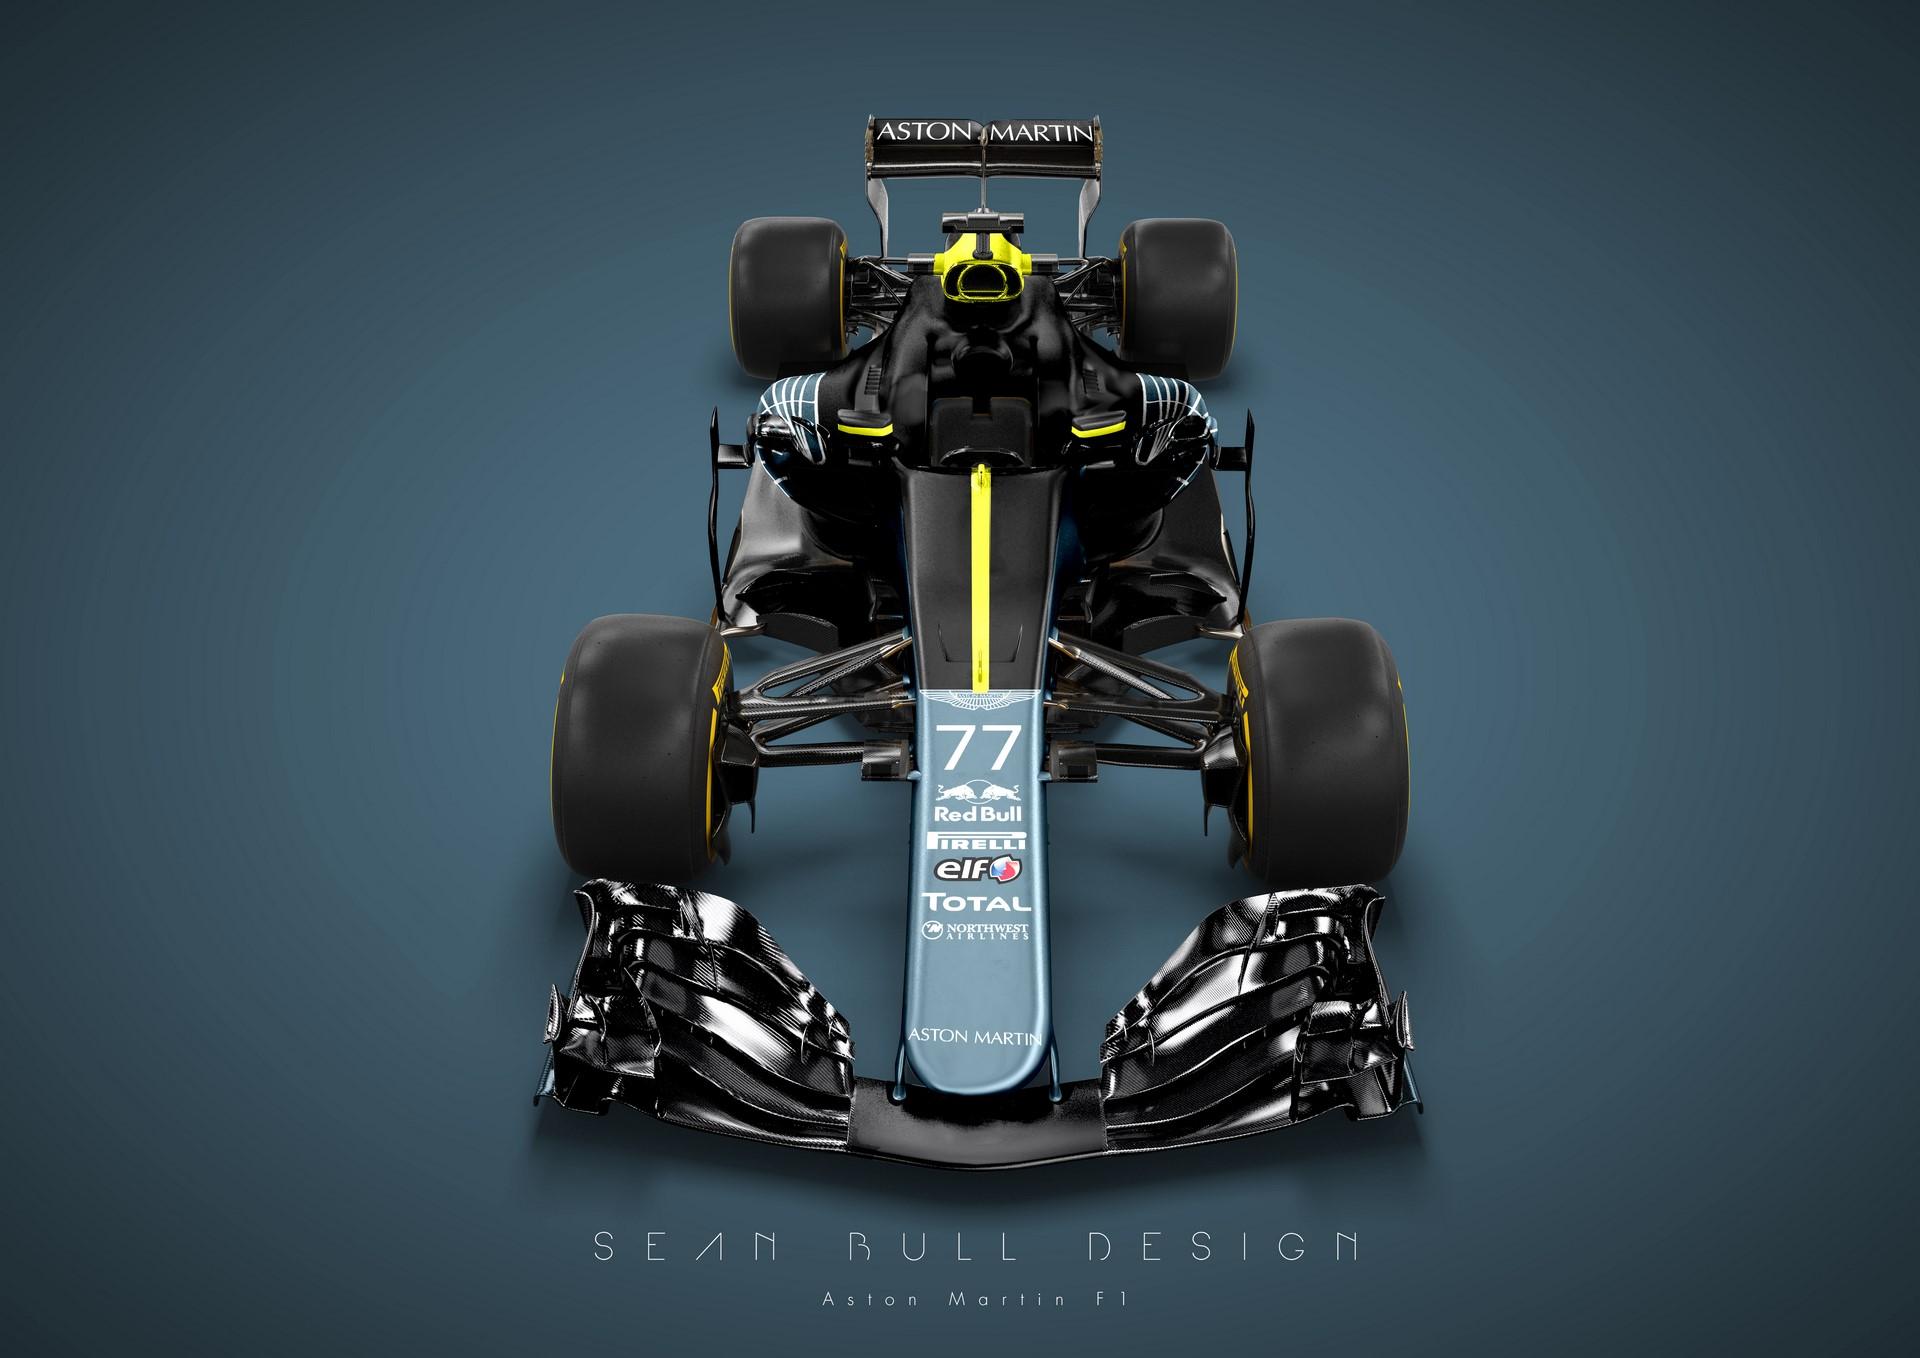 Aston Martin F1 (7)